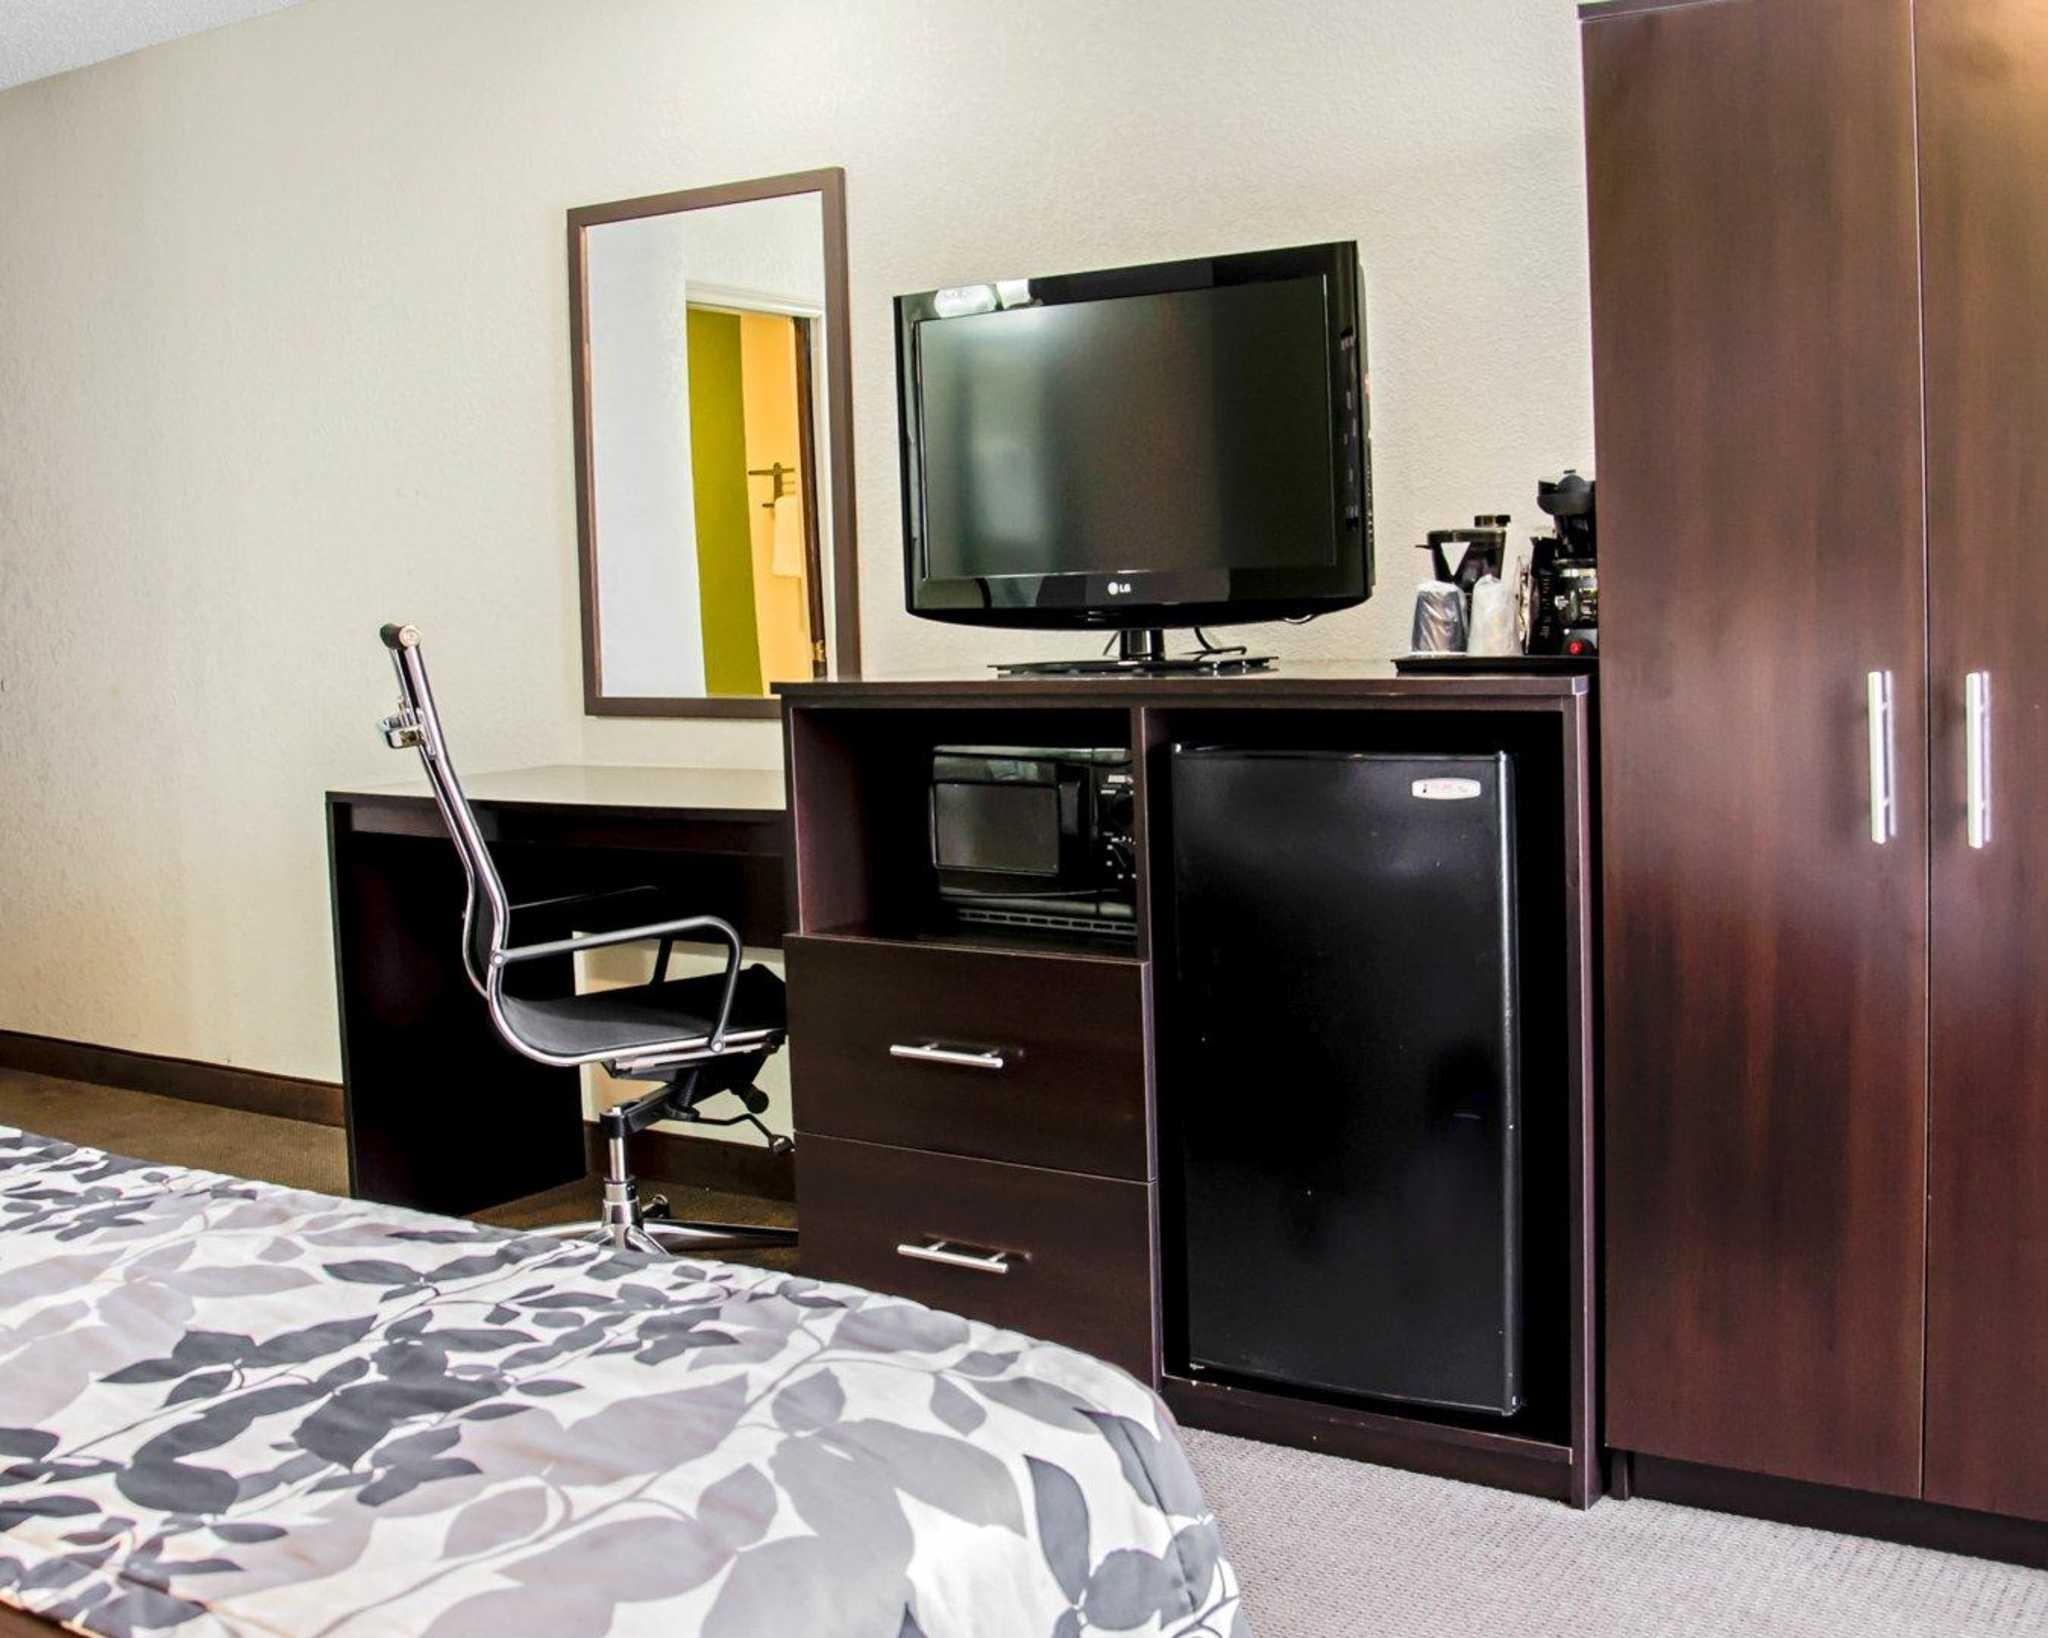 Sleep Inn Concord - Kannapolis image 8